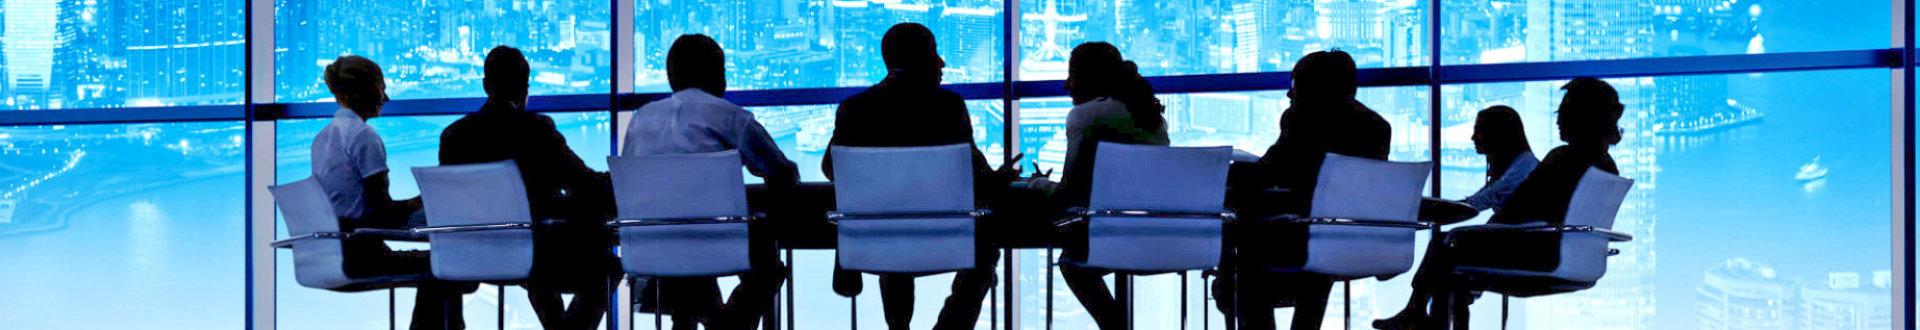 board directors having a meeting inside a meeting room